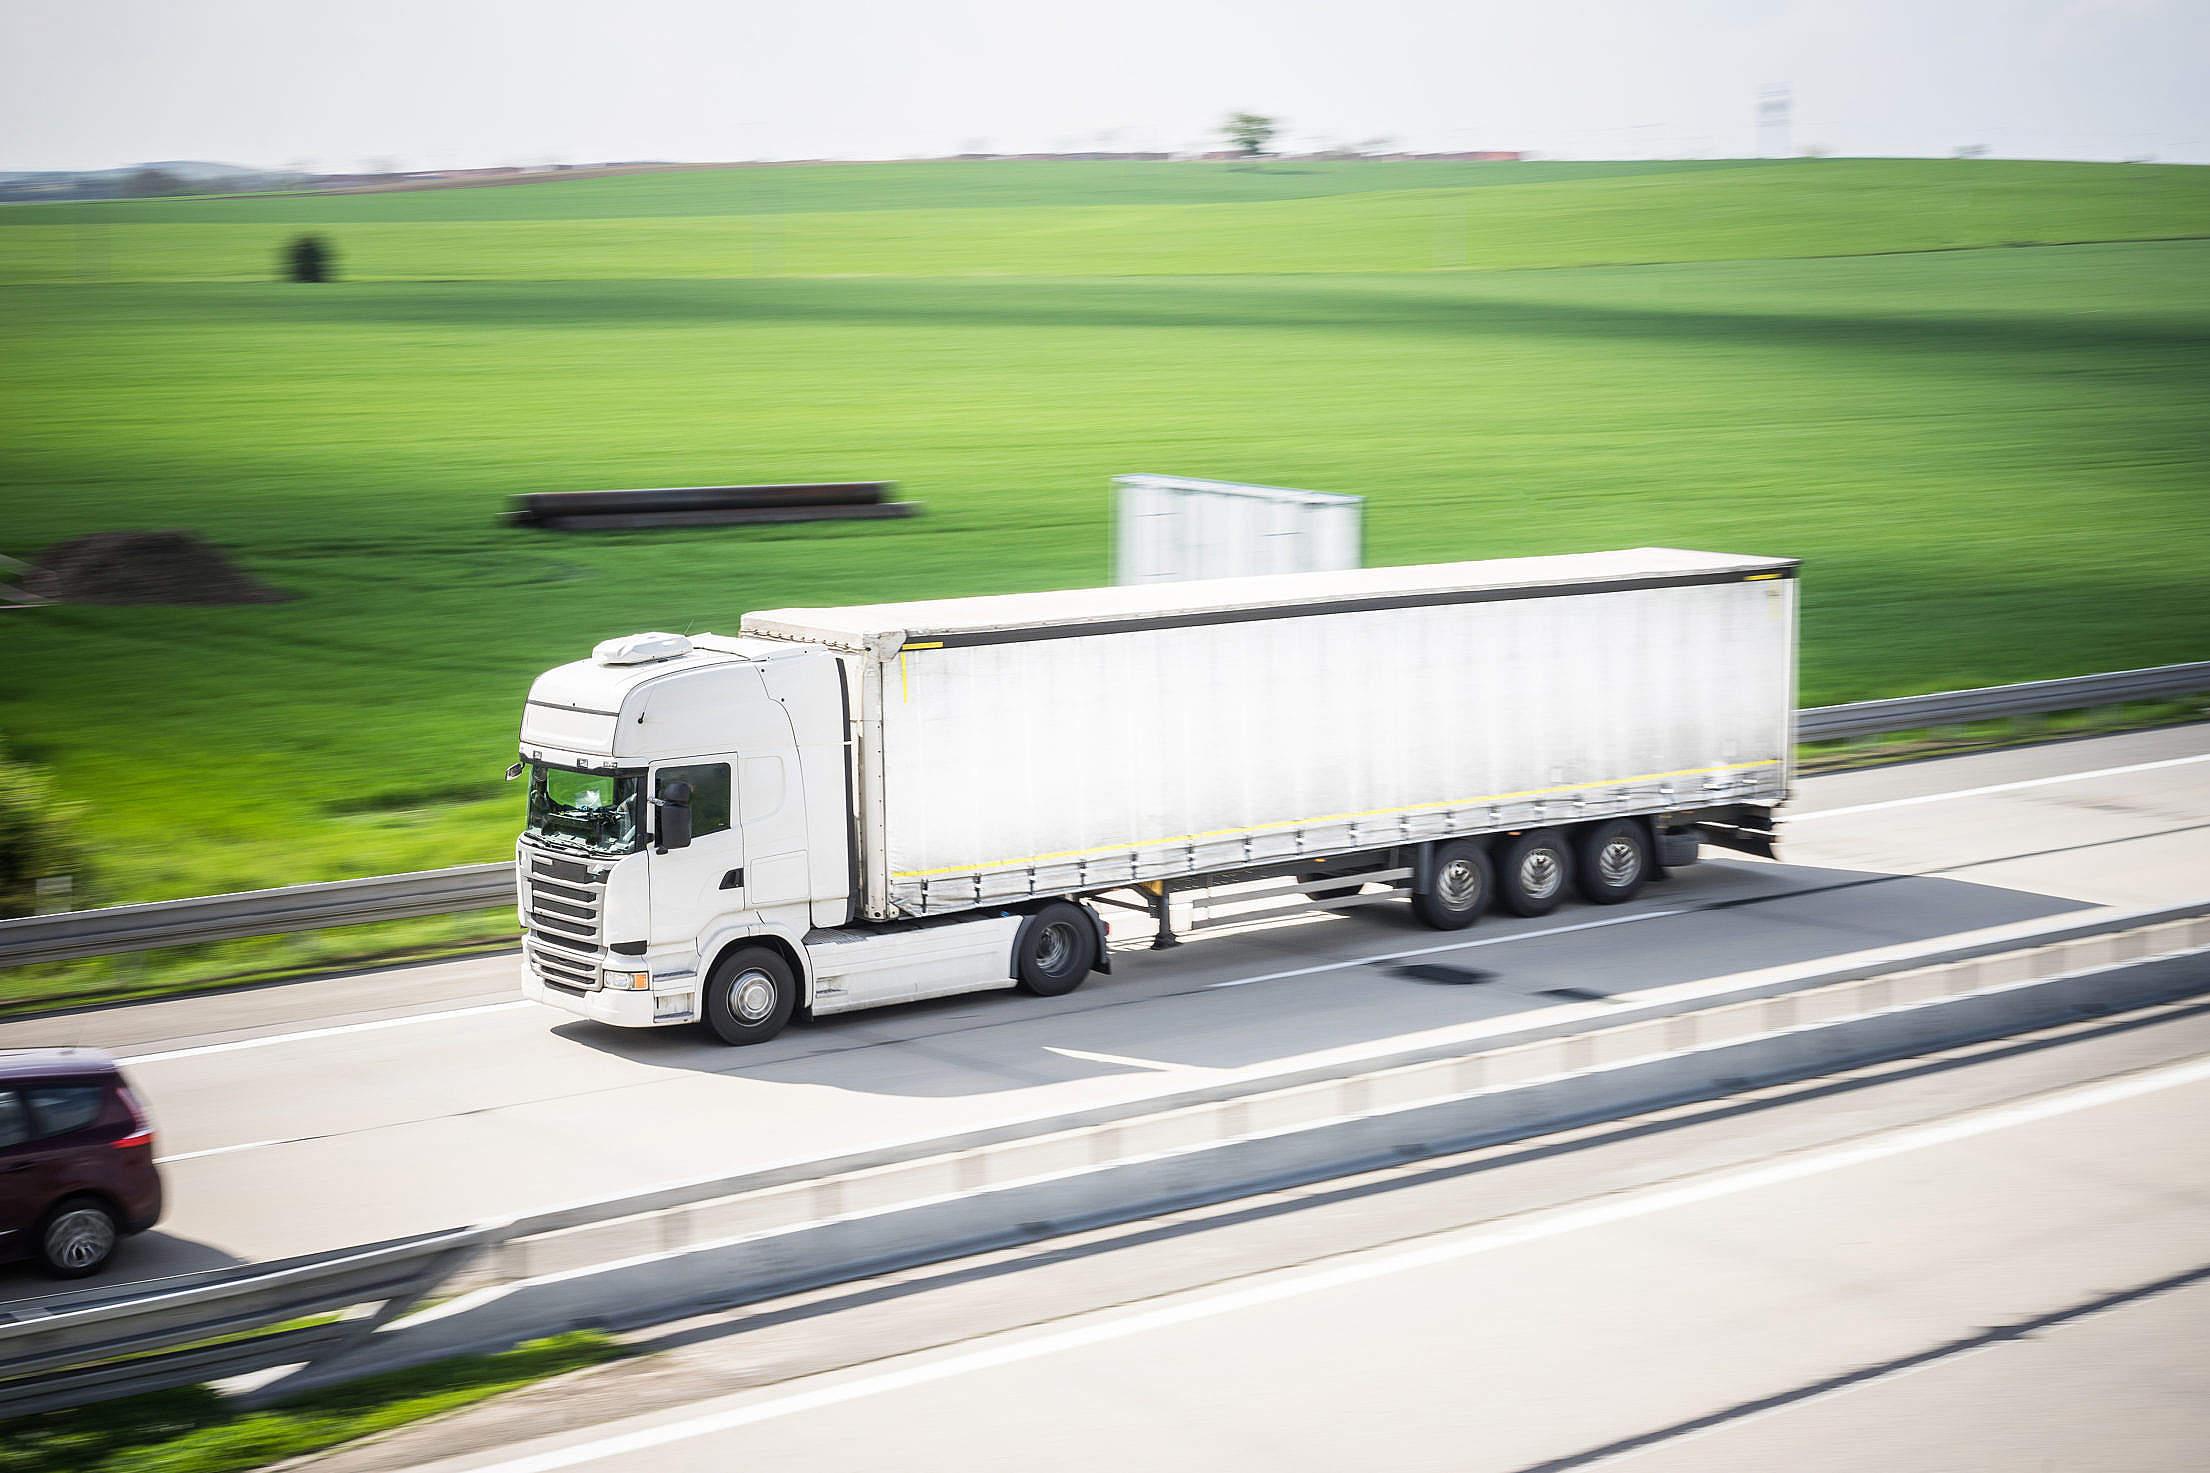 white-tir-truck-in-motion-driving-on-highway_free_stock_photos_picjumbo_DSC04205-2210x1473